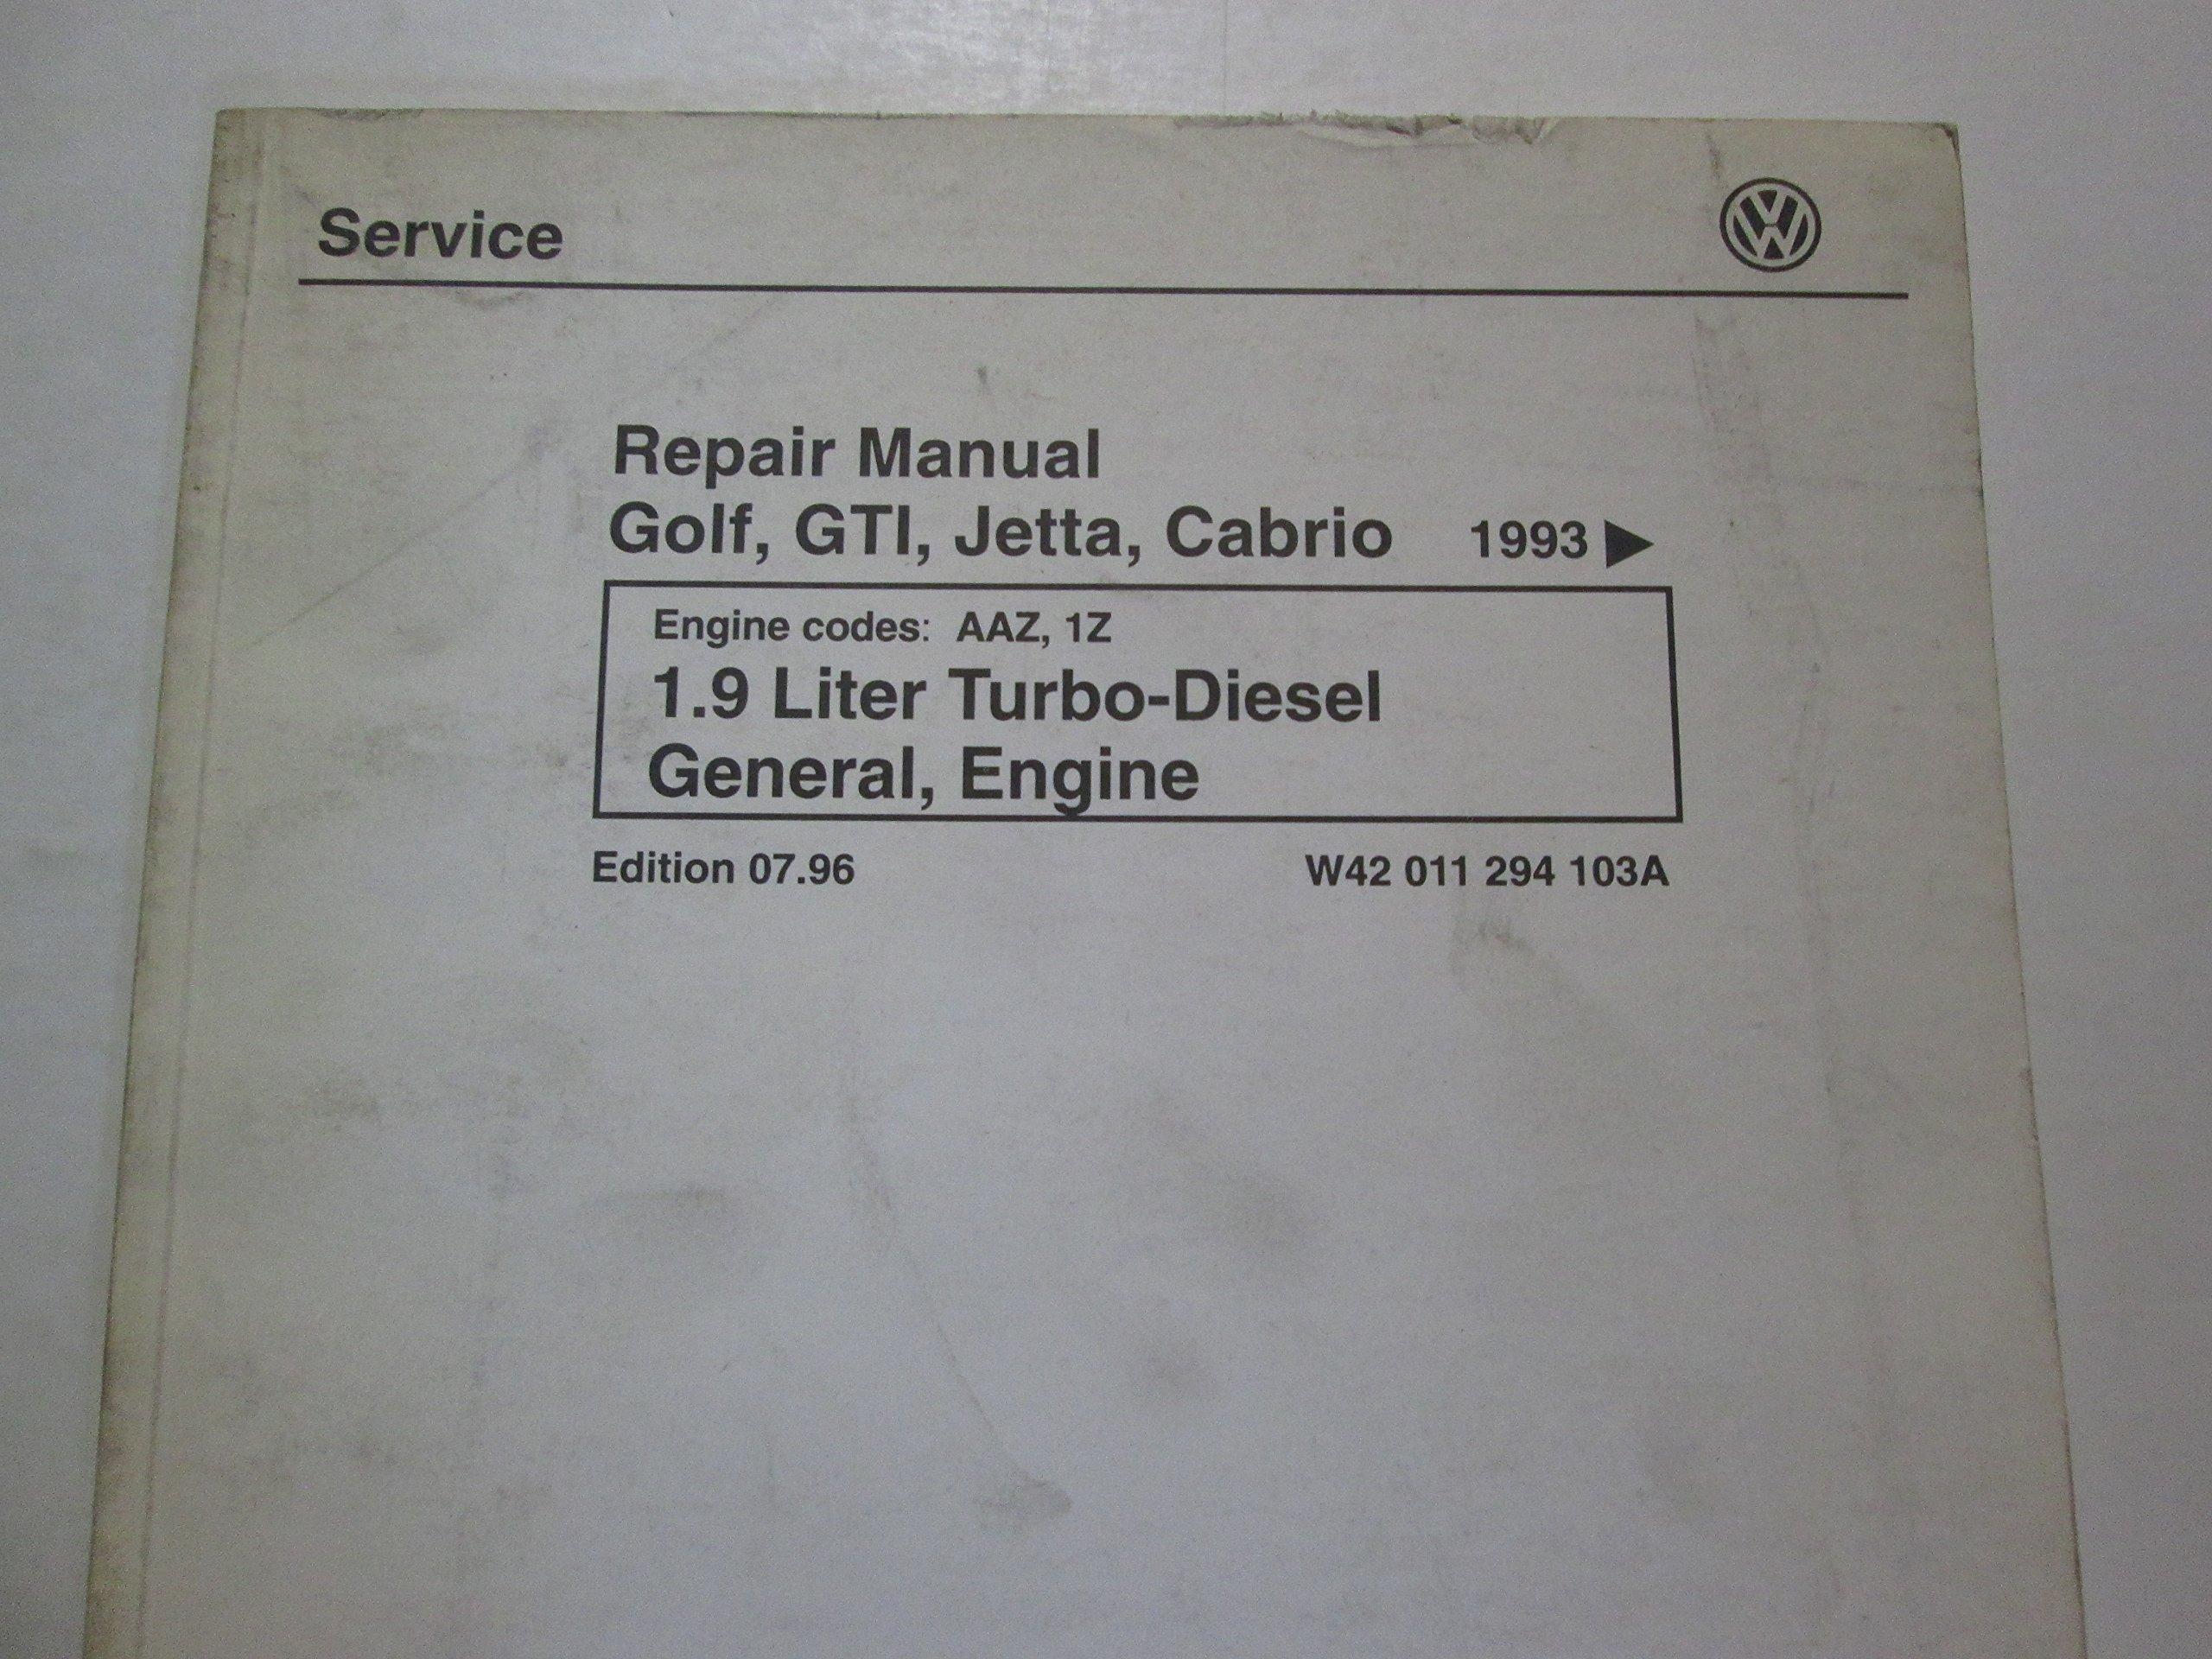 1993 97 VW Golf GTI Jetta Cabrio 1.9 Turbo sel General ...  Volkswagen Jetta Engine Diagram on 97 jetta heater core, 97 jetta 2.0 supercharger kit, 2002 vw jetta coolant diagram, 97 montero sport engine diagram, 97 altima engine diagram, 97 rav4 engine diagram, 97 jetta headlights, 97 jetta crank sensor, 97 jetta thermostat, 97 sebring engine diagram, 97 cavalier engine diagram, 97 jetta head gasket, 97 jetta fuel pump, 97 accord engine diagram, 97 jetta starter, 97 jetta relay, 97 taurus engine diagram, vw vr6 engine diagram, 97 jetta 2.0 turbo kit, 97 pathfinder engine diagram,